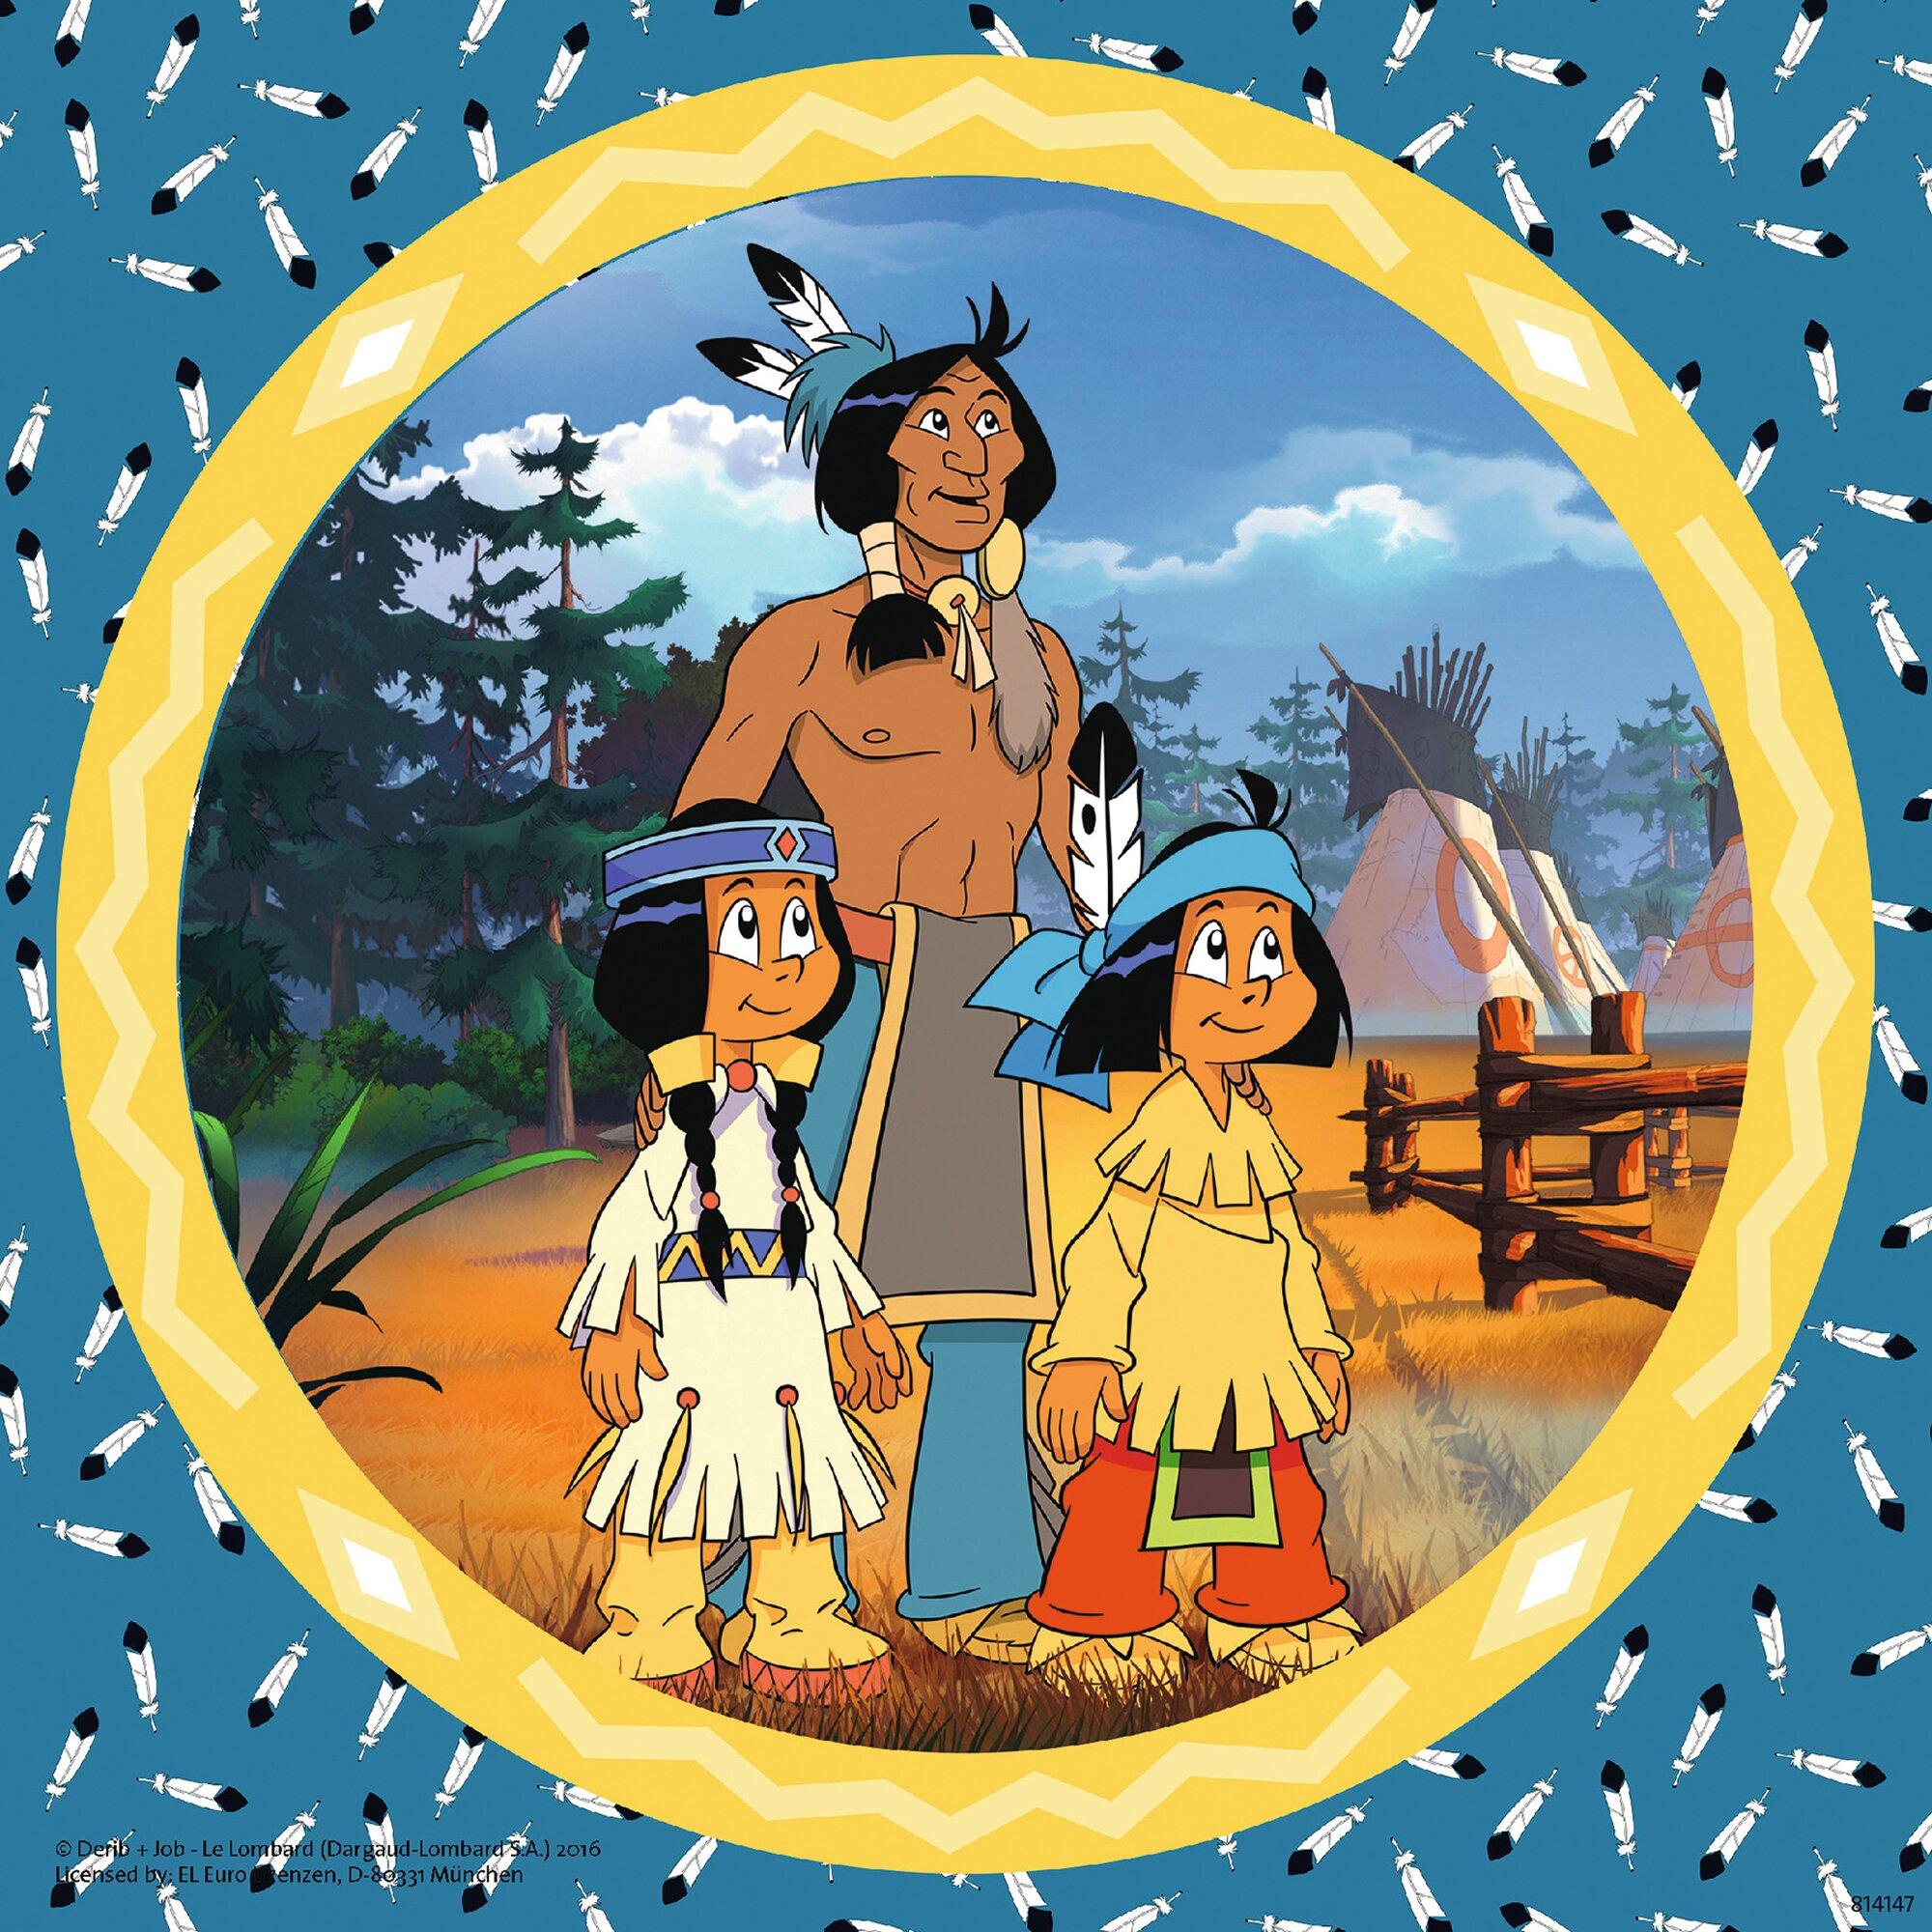 ravensburger-drei-kinderpuzzles-inkl-mini-postern-49-teile-yakari-der-tapfere-indianer